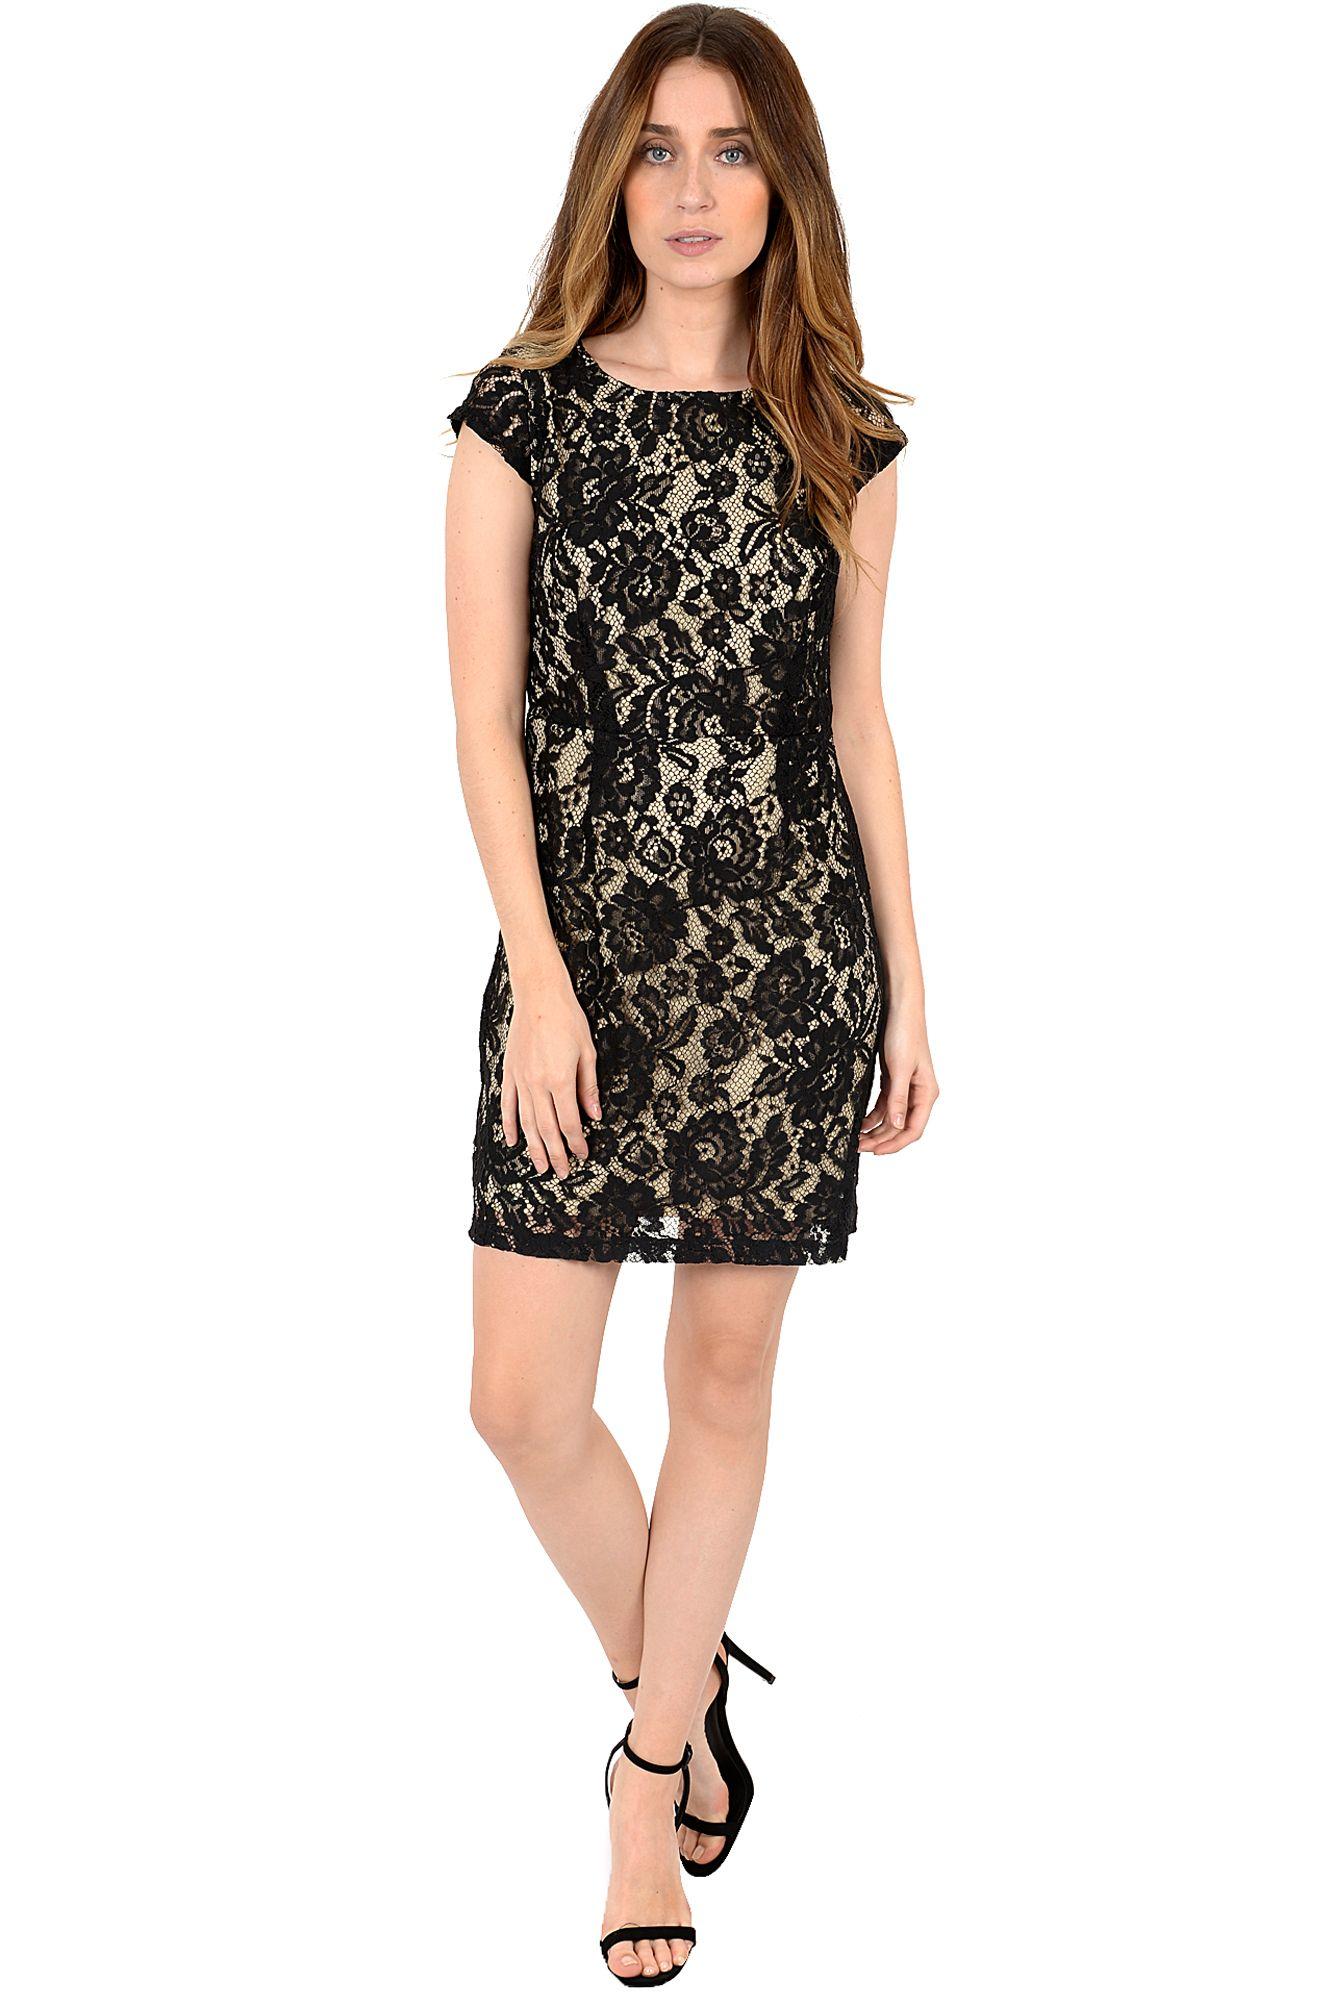 Galerry closet flared dress black white